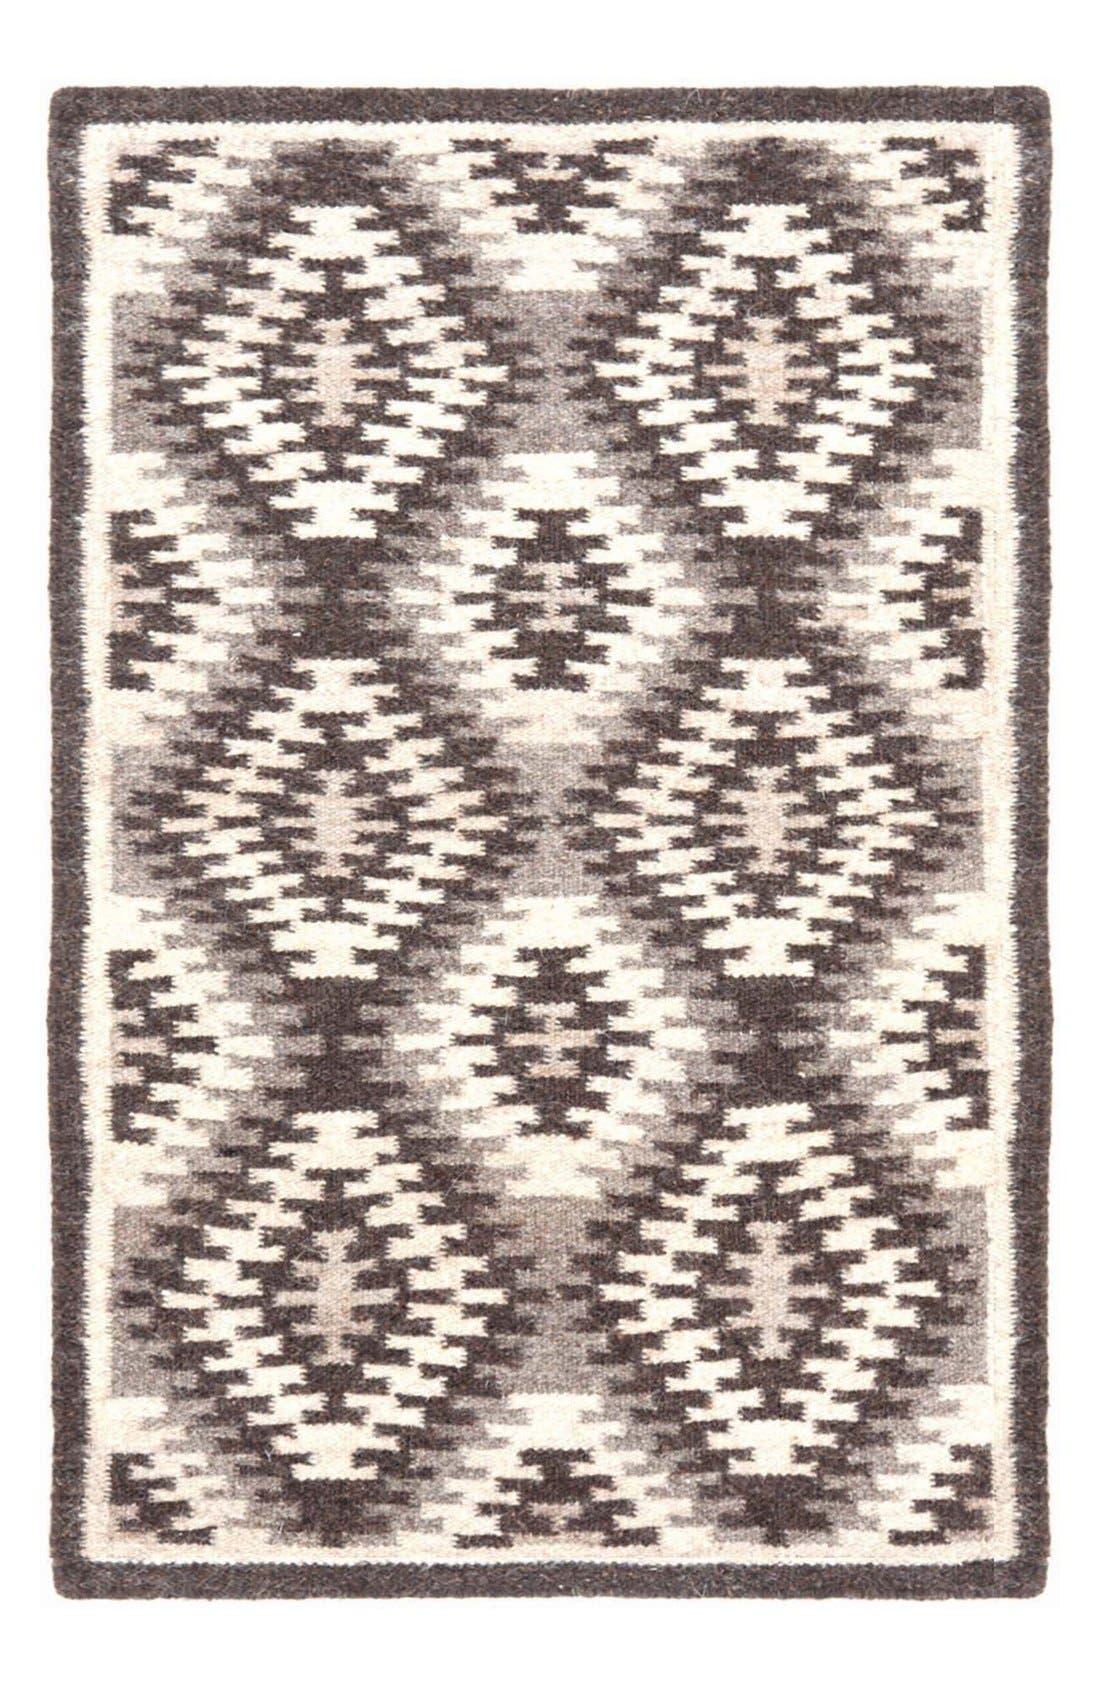 DASH & ALBERT 'Nordic Kilim' Wool Blend Rug